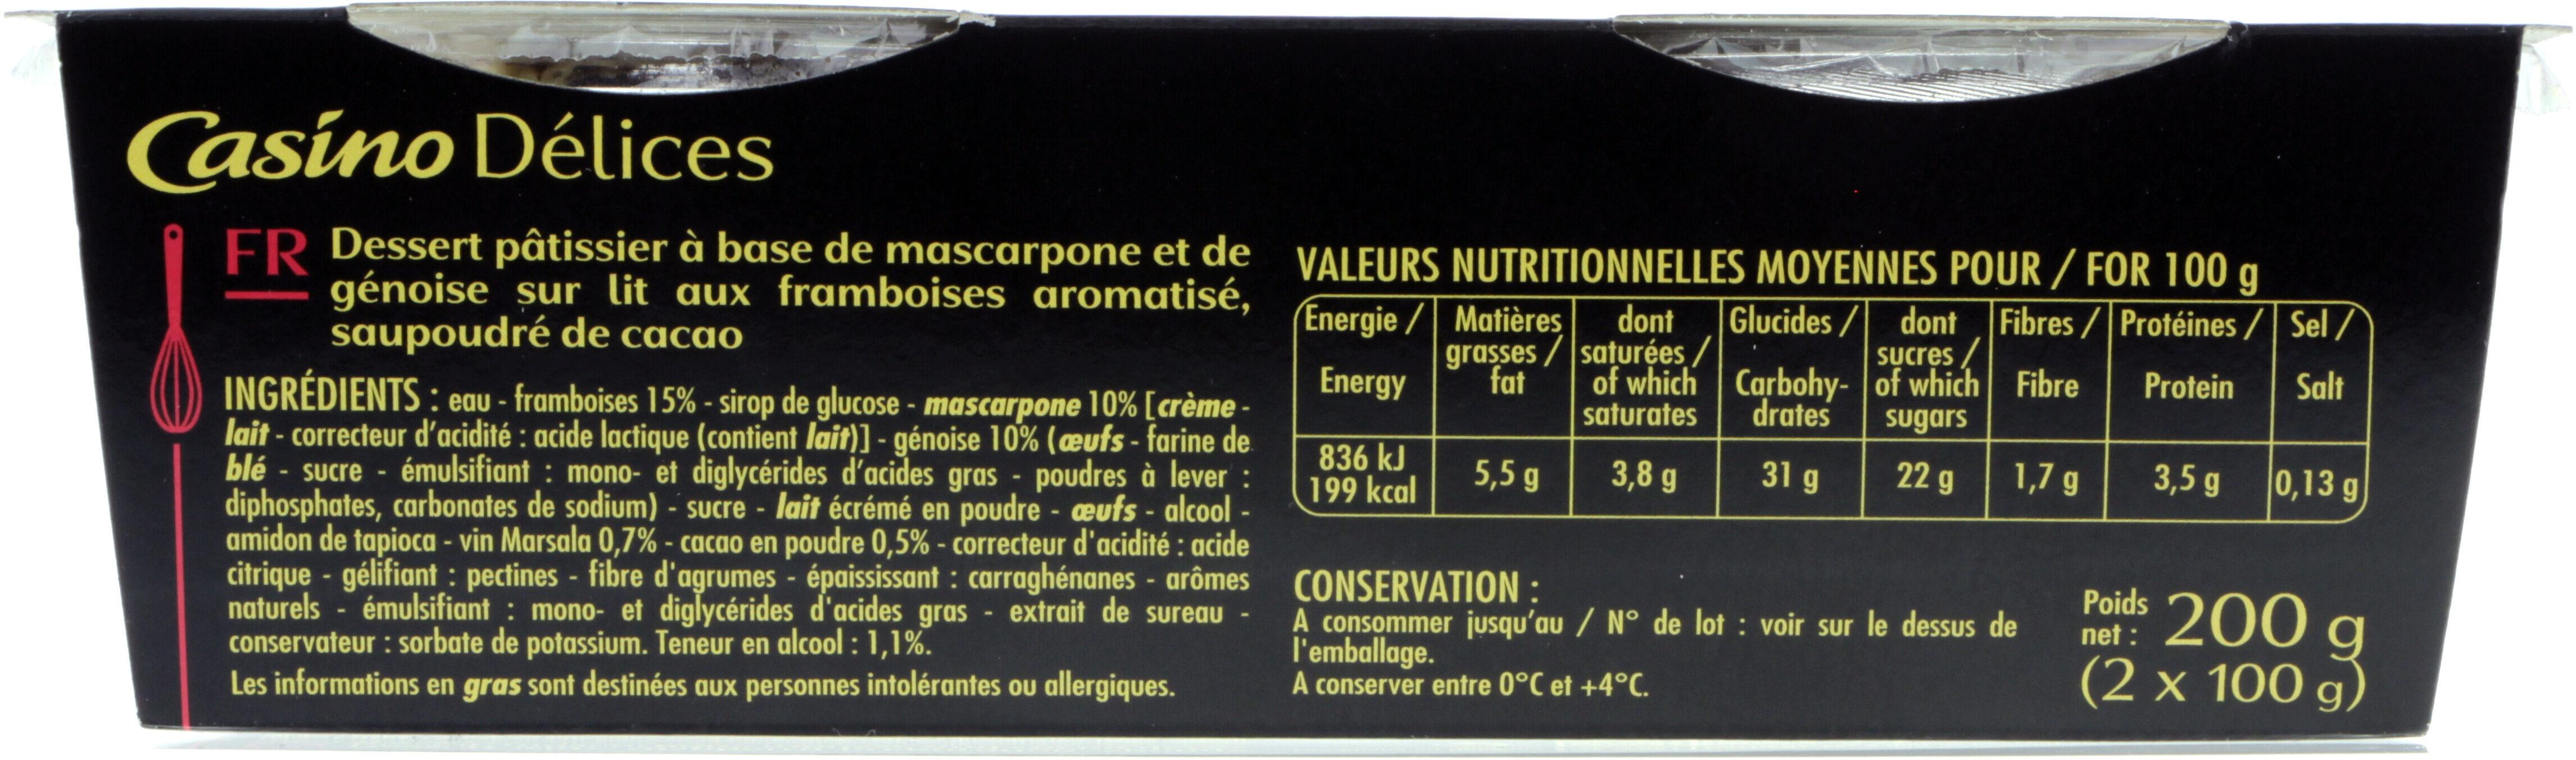 Tiramisu Framboise - Informations nutritionnelles - fr